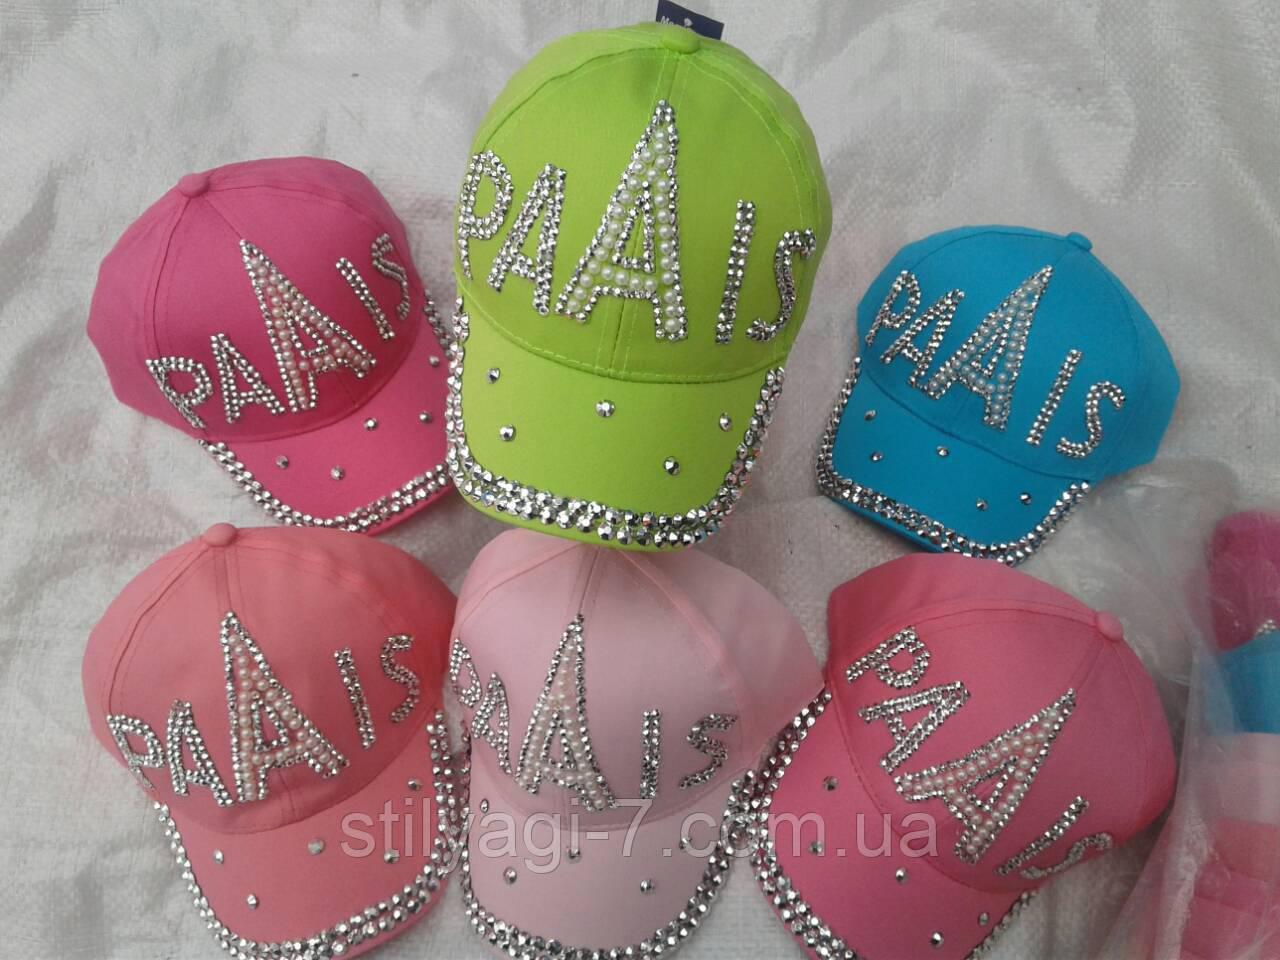 Кепка для девочки 52р розового,белого,персик,голубого цвета камешки Париж оптом